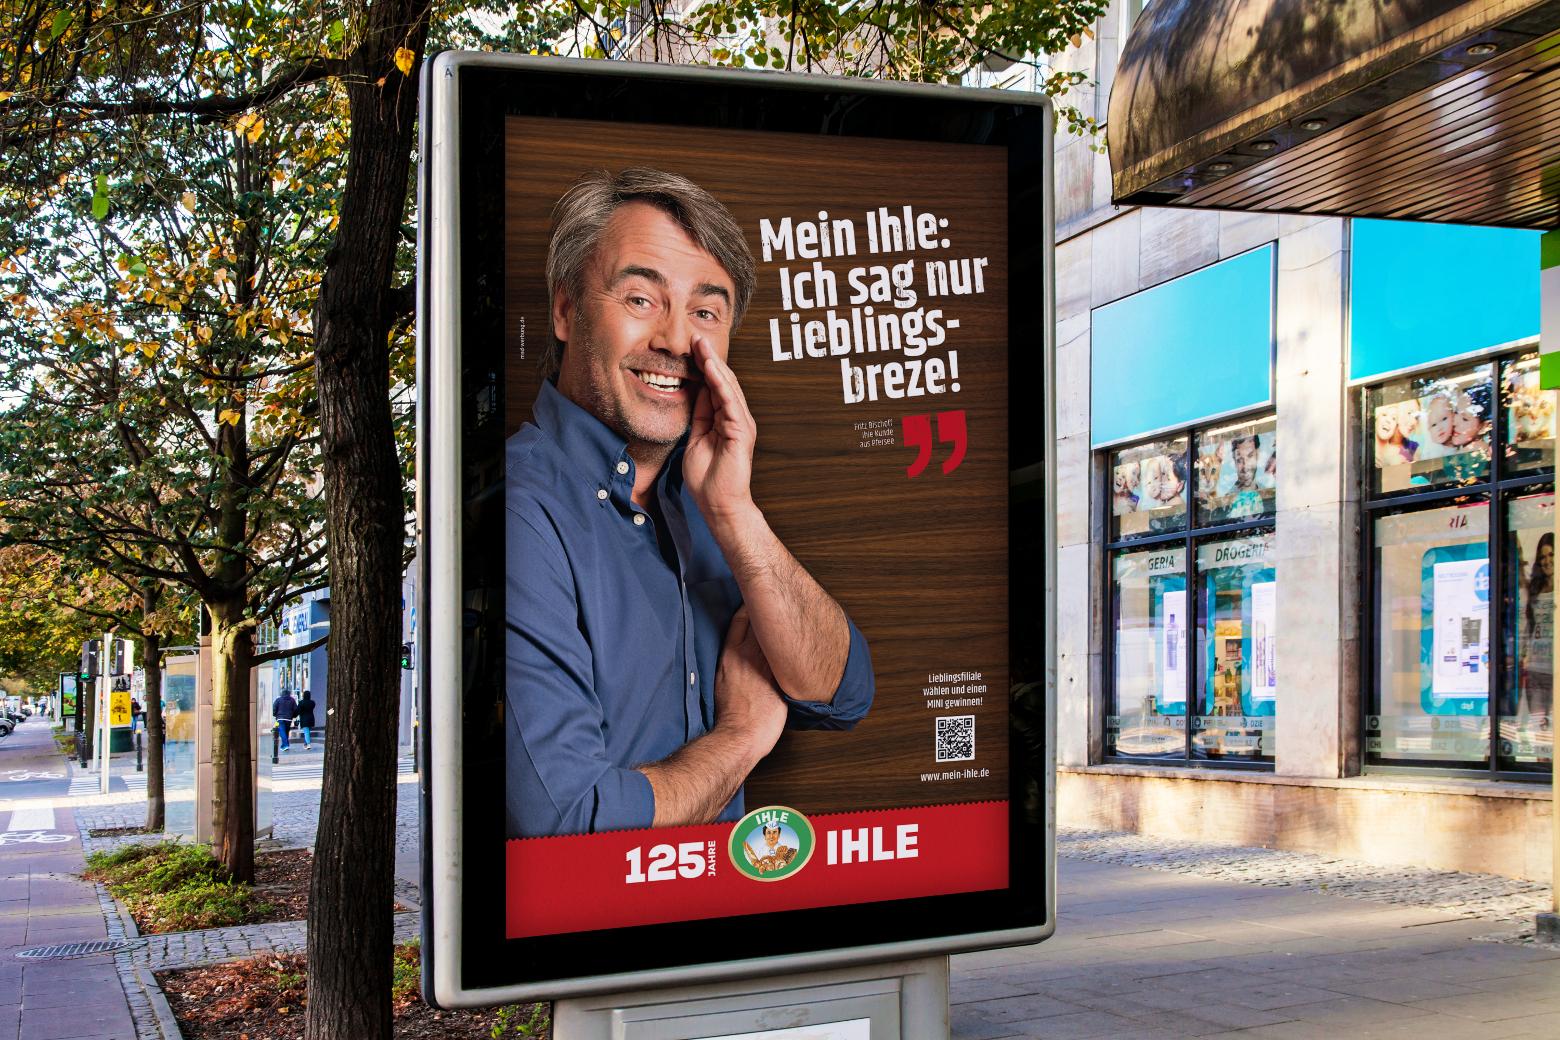 Ihle-Lieblingsbreze-Anzeige_02